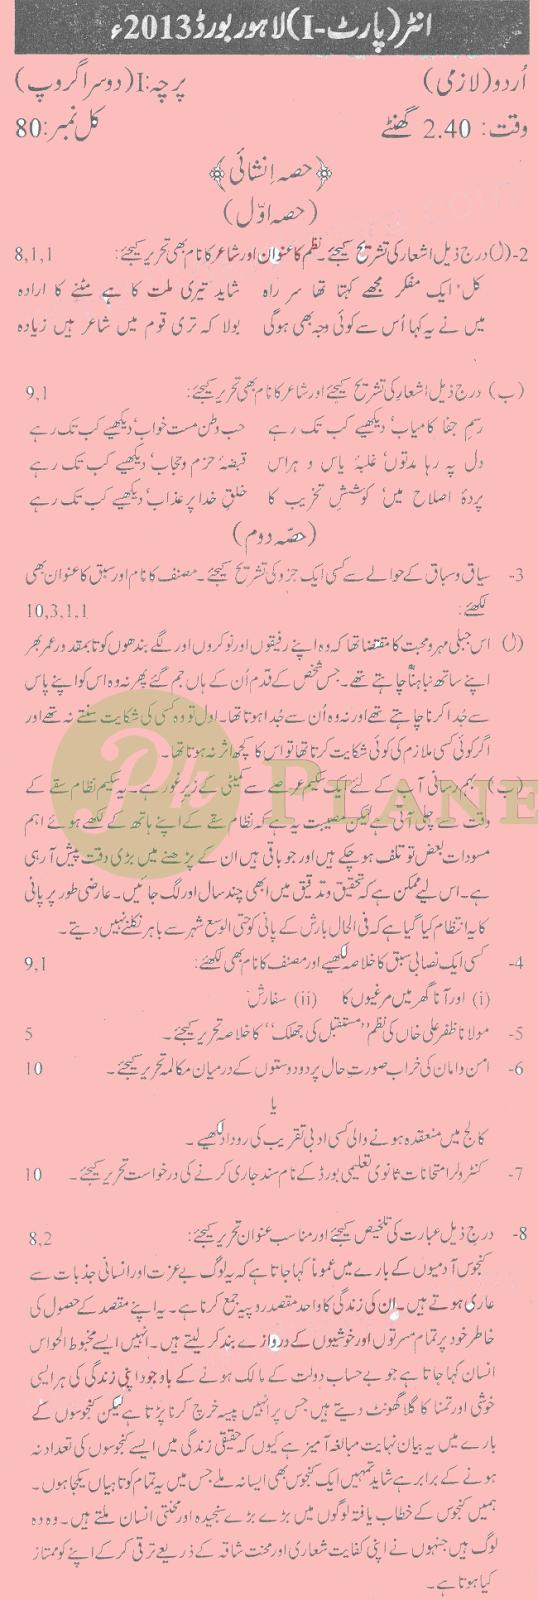 Past Papers of Urdu Inter part 1 Lahore Board 2013